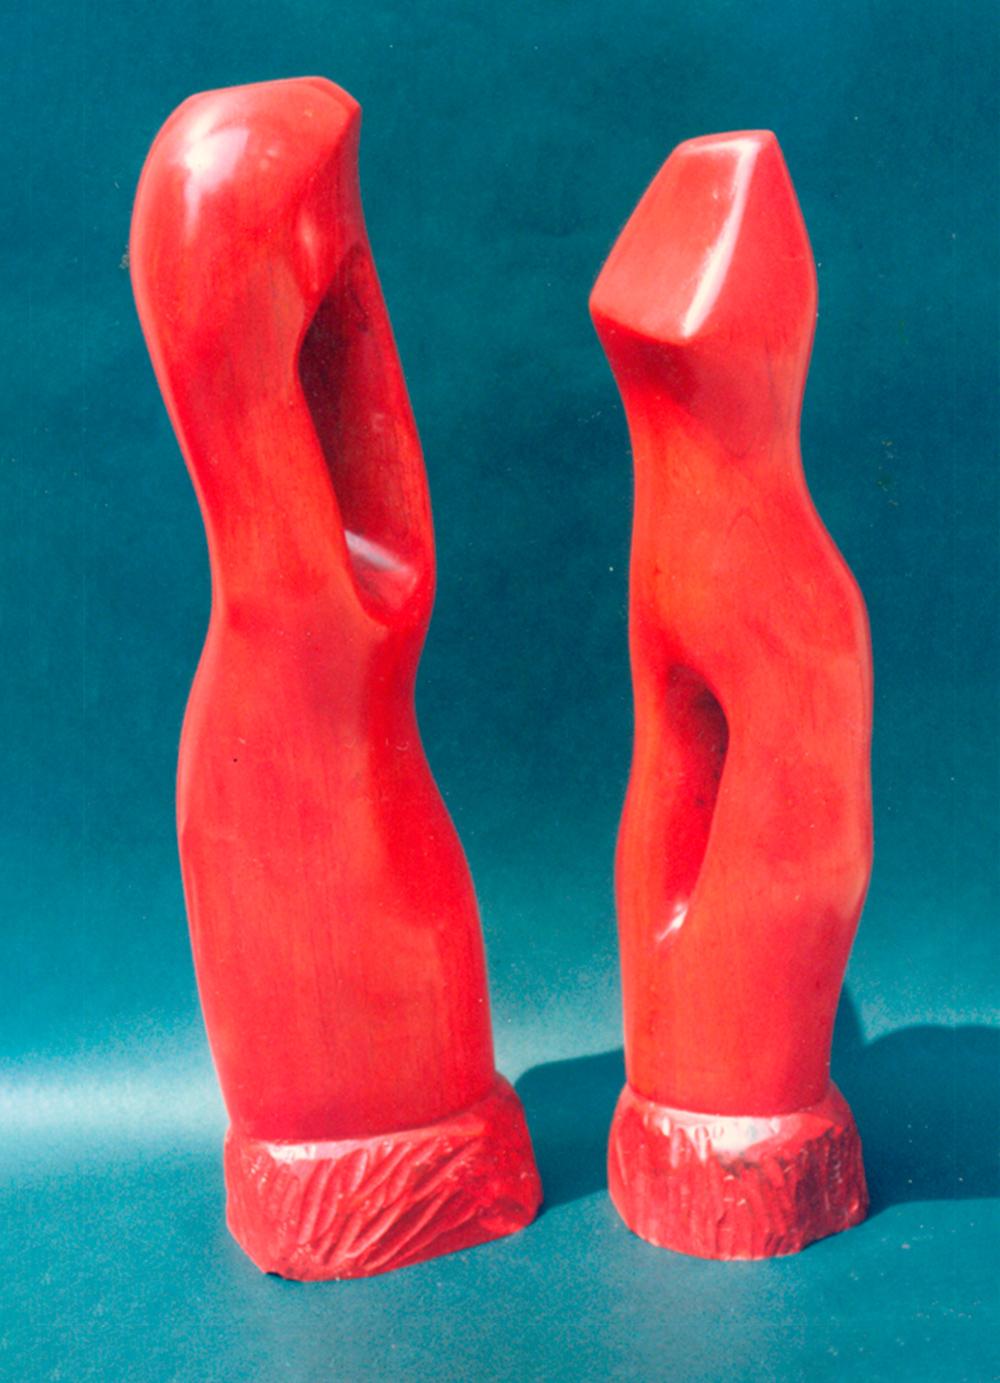 Escultura-Hercules-y-Diana-A-Figurativo-Abstracto-RD.Escultor